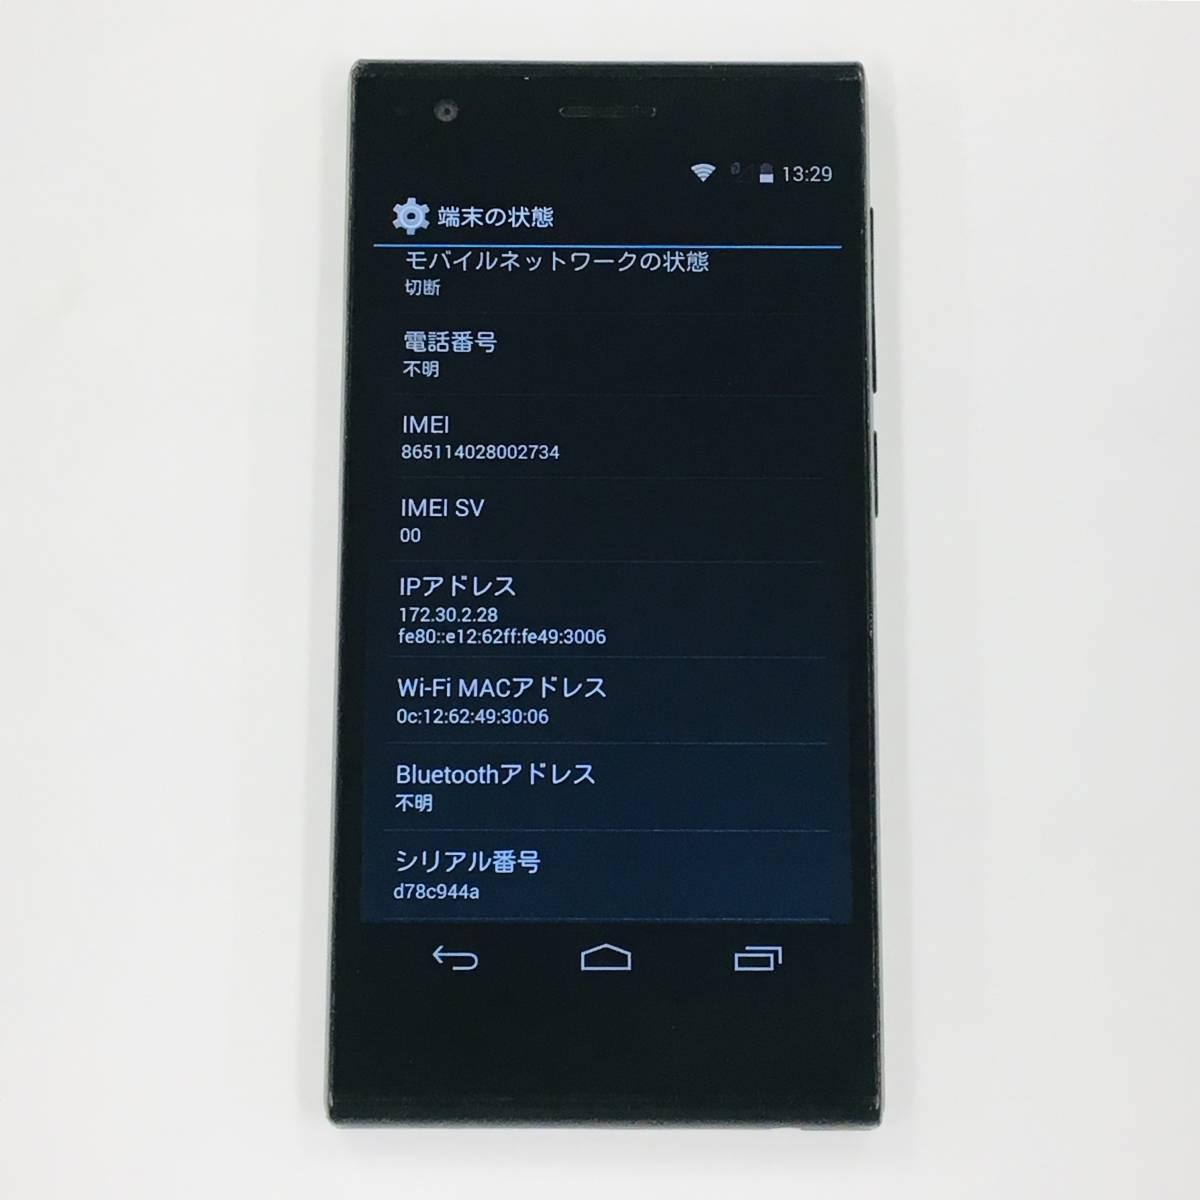 FP050543_(312)【送料無料】ZTE/Blade Vec 4G/ブラック/16GB/Wi-Fi+SIMモデル/SIMフリー/android/スマートフォン/スマホ【中古】_画像3